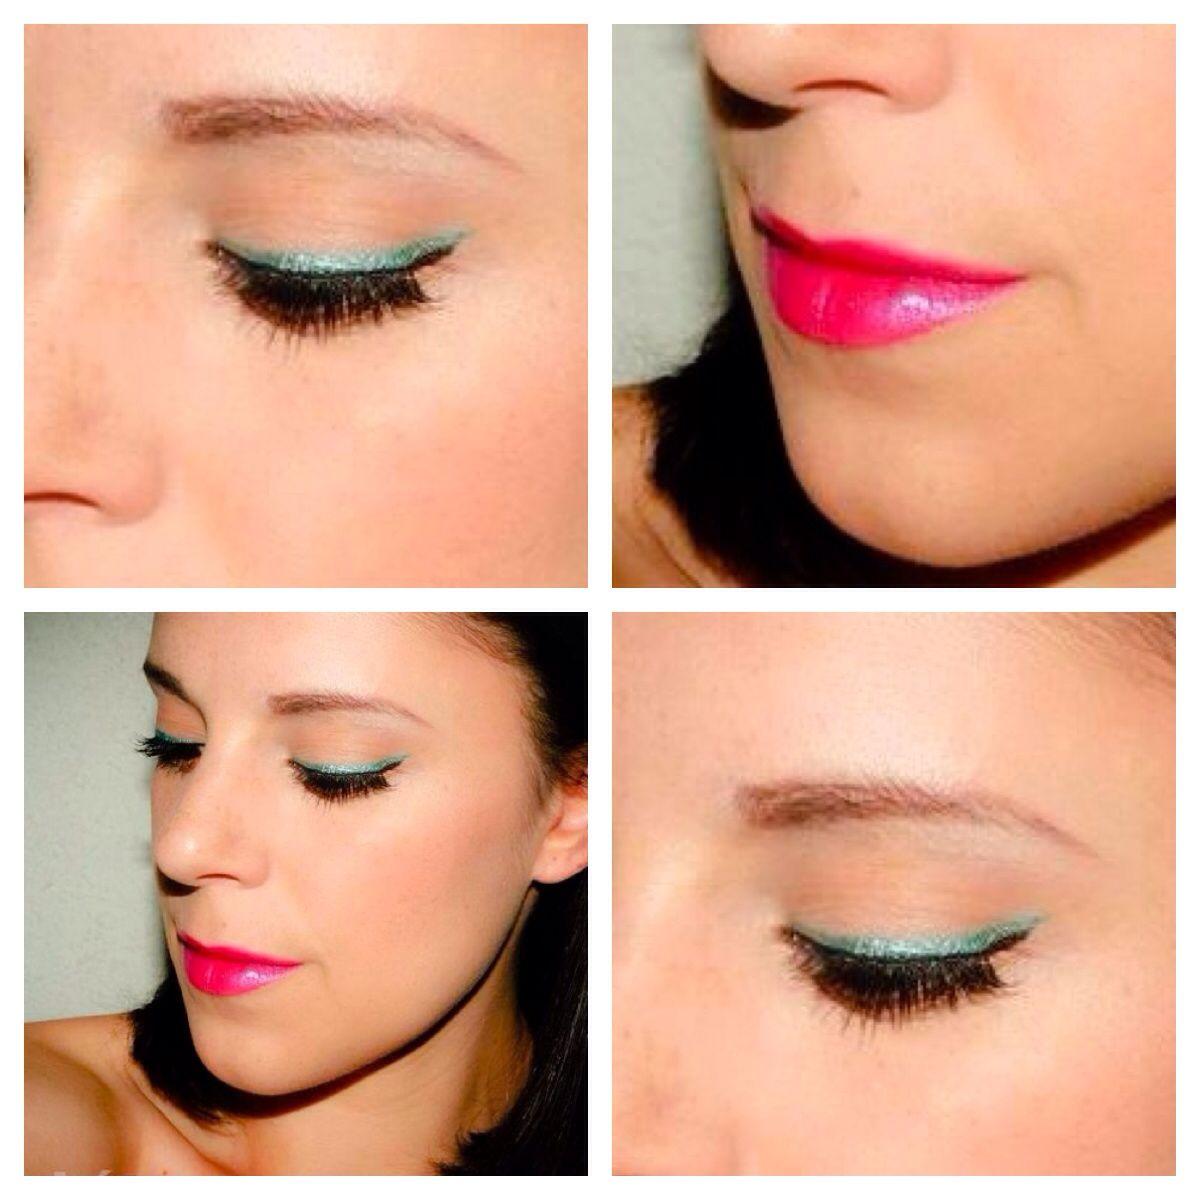 Maquillaje fresco inspirado en Katy Perry http//youtu.be